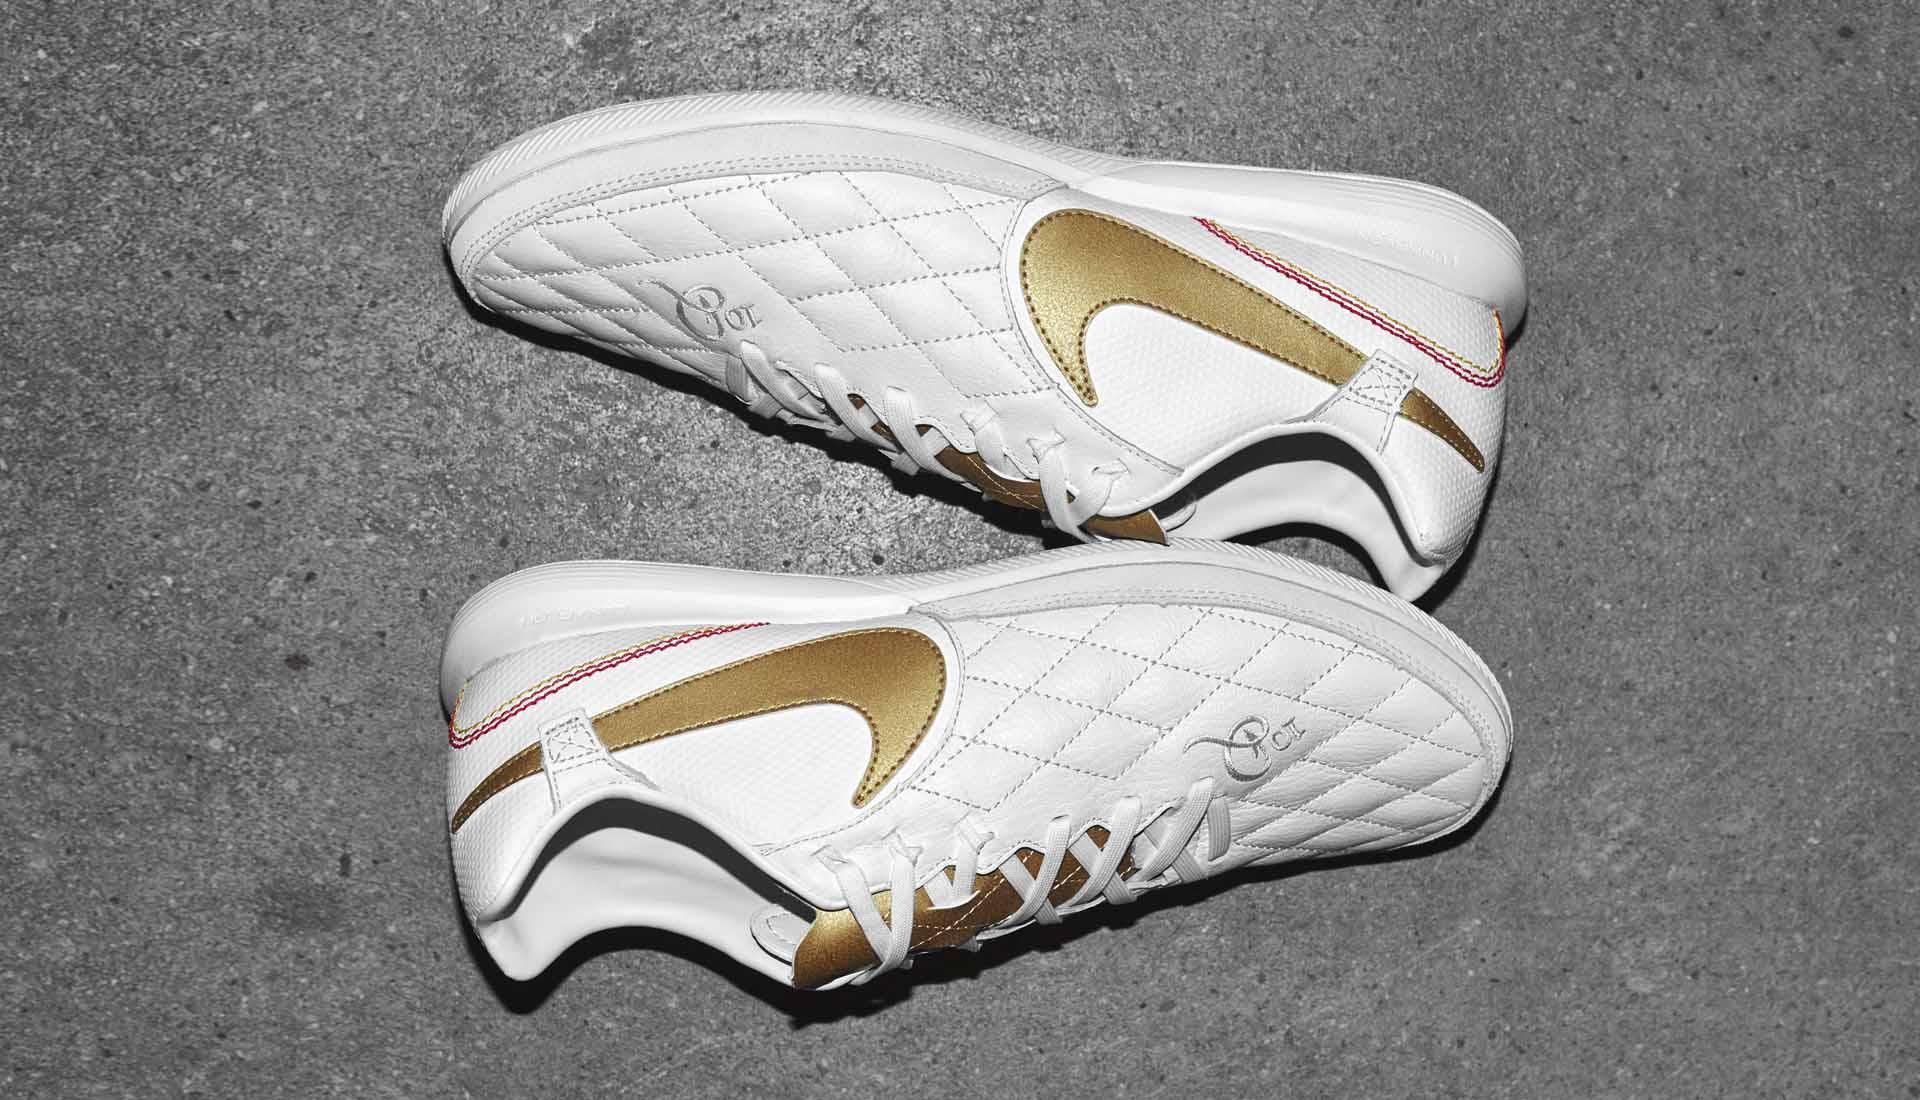 chaussures-football-Nike-Tiempo-X-10R-Barcelone-img4